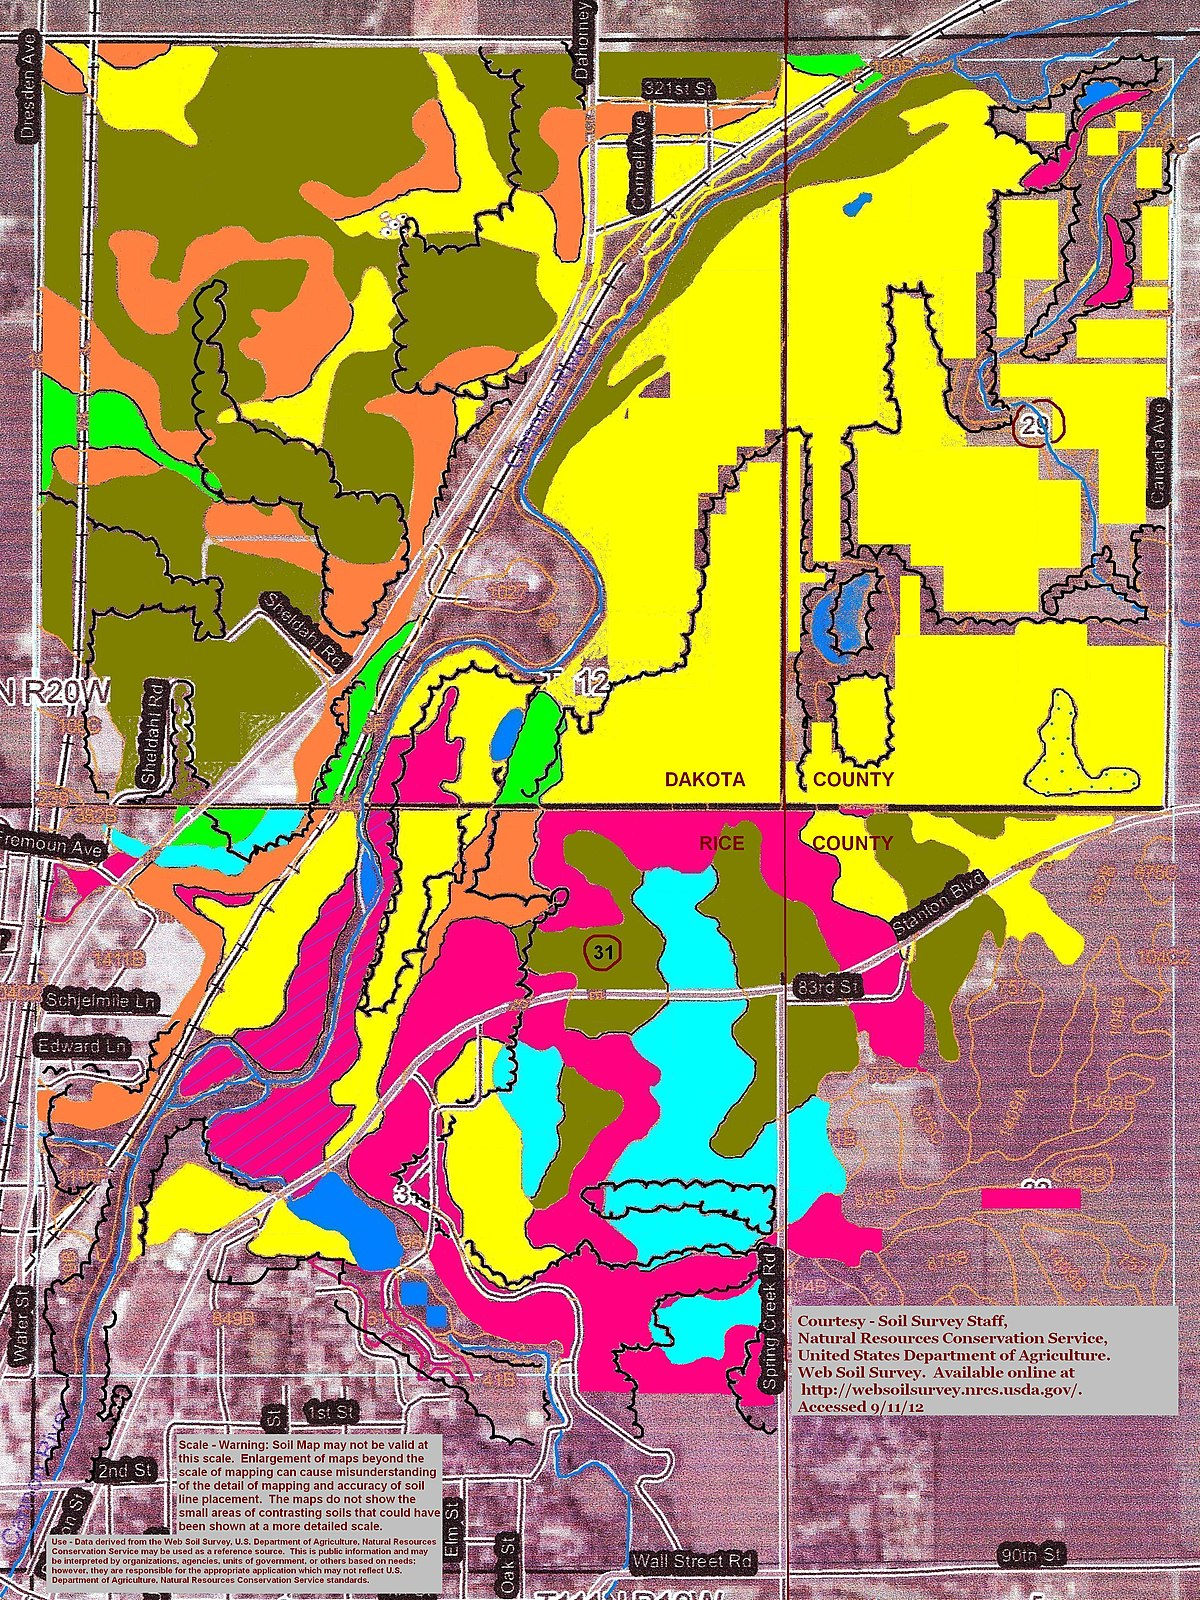 File:Carleton College Arboretum Area Wiki Version.JPG ...